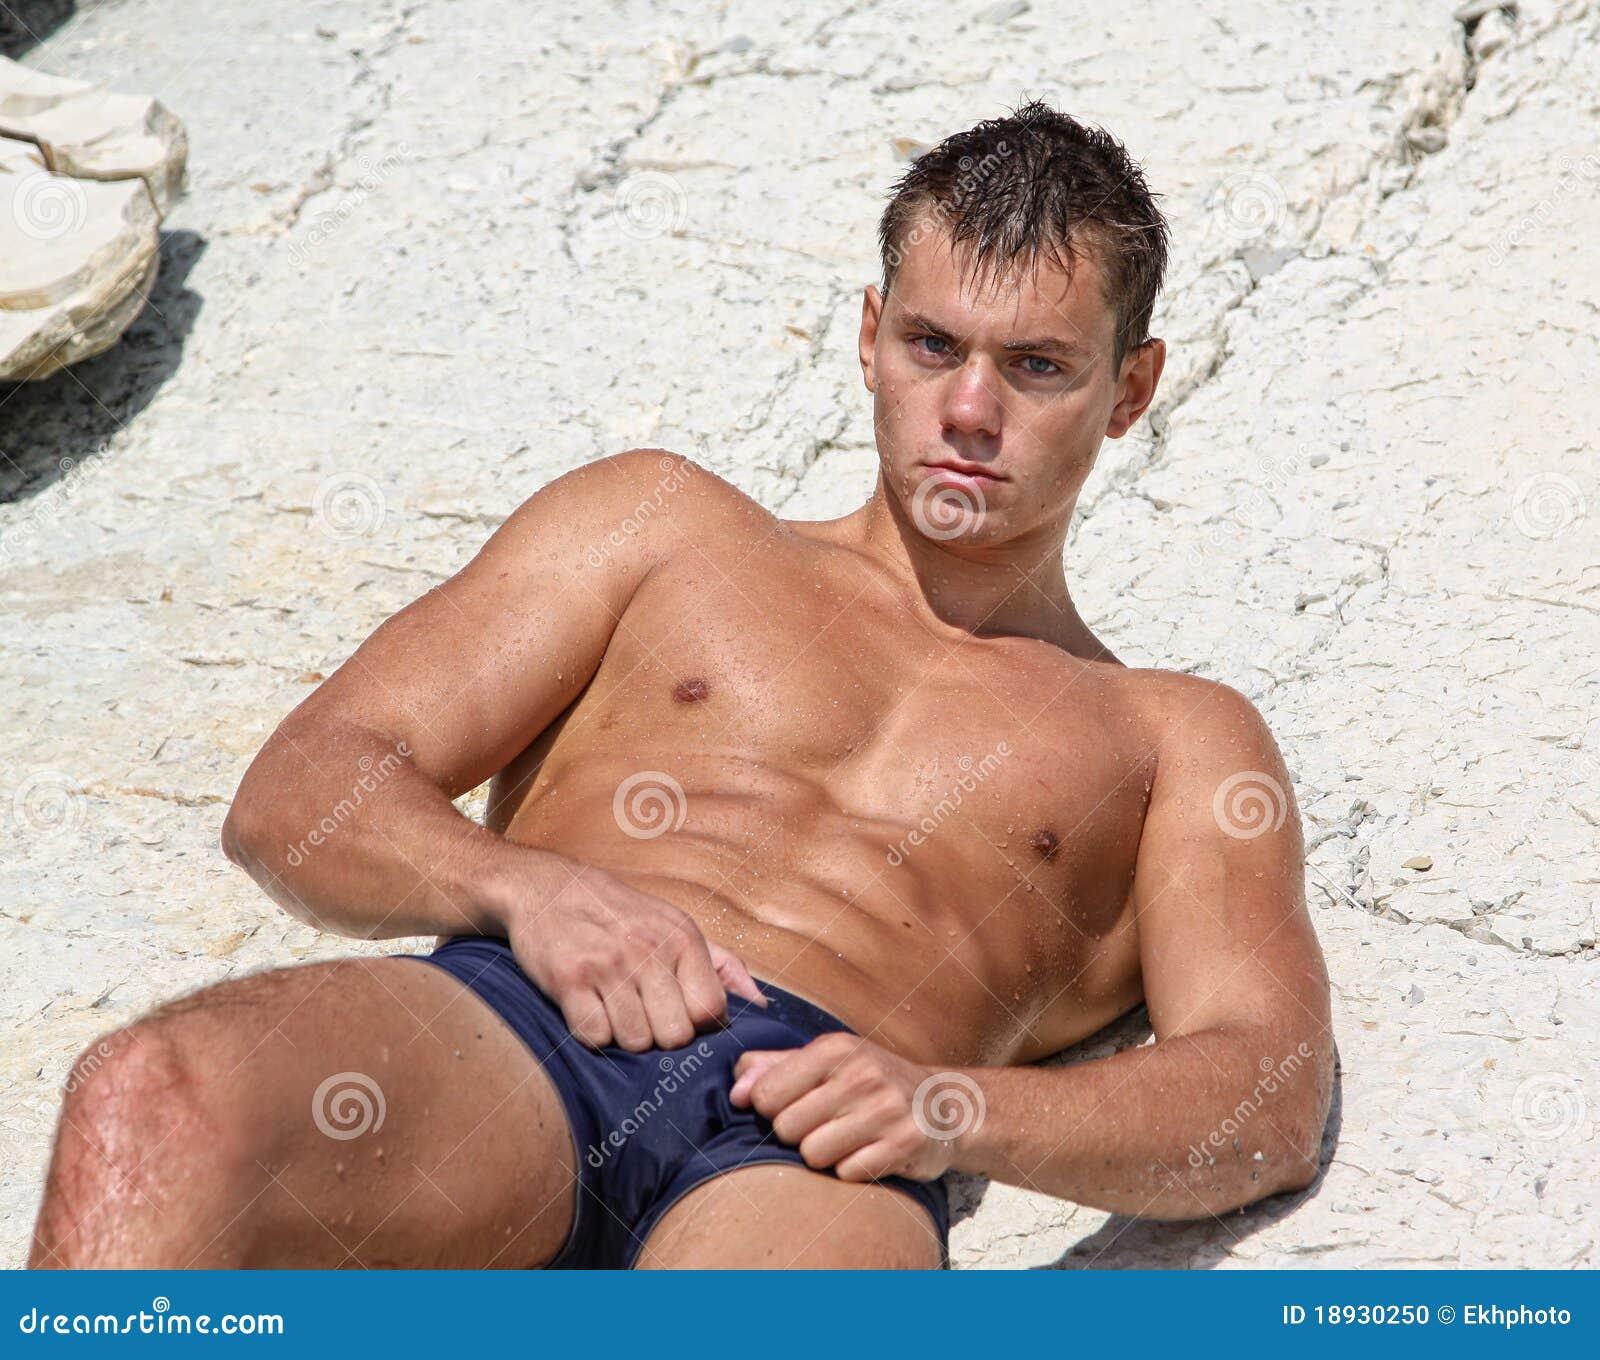 escort na ragazzo gay nudo